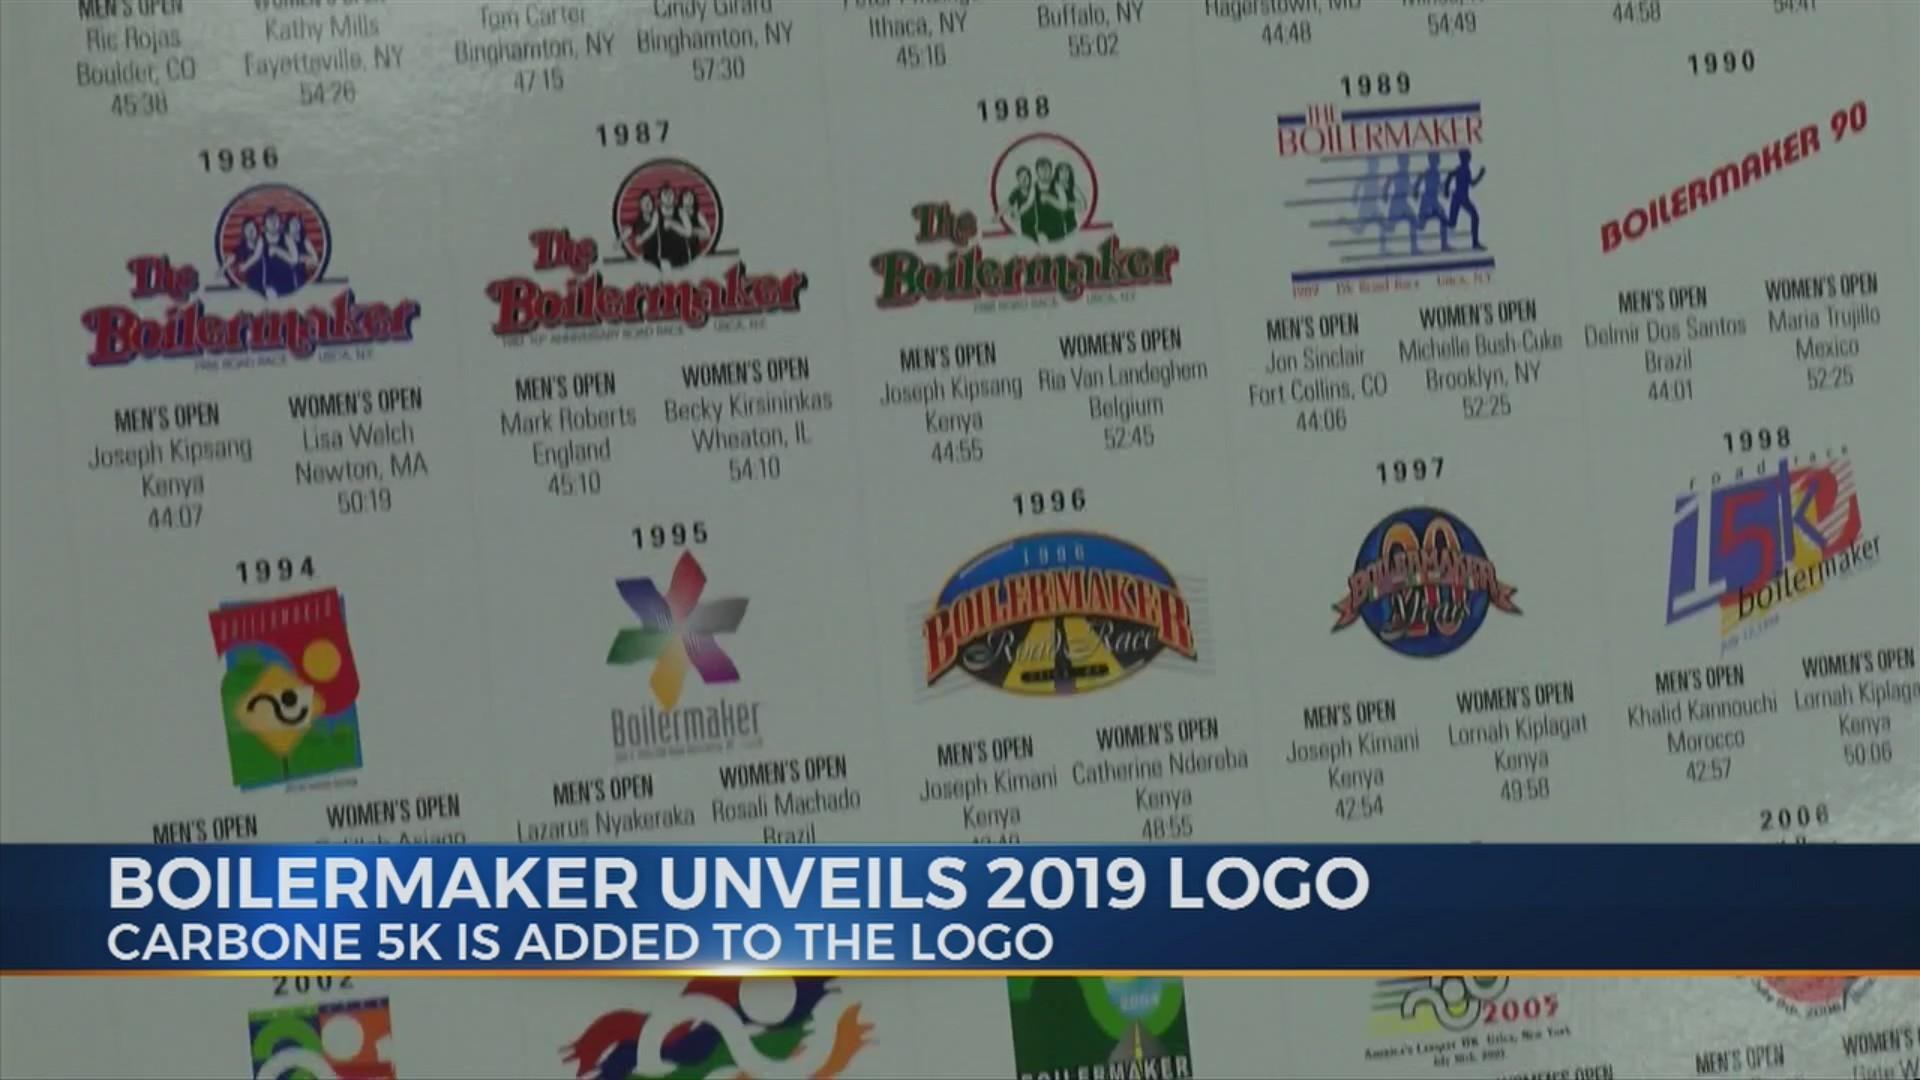 Boilermaker Unveils 2019 logo